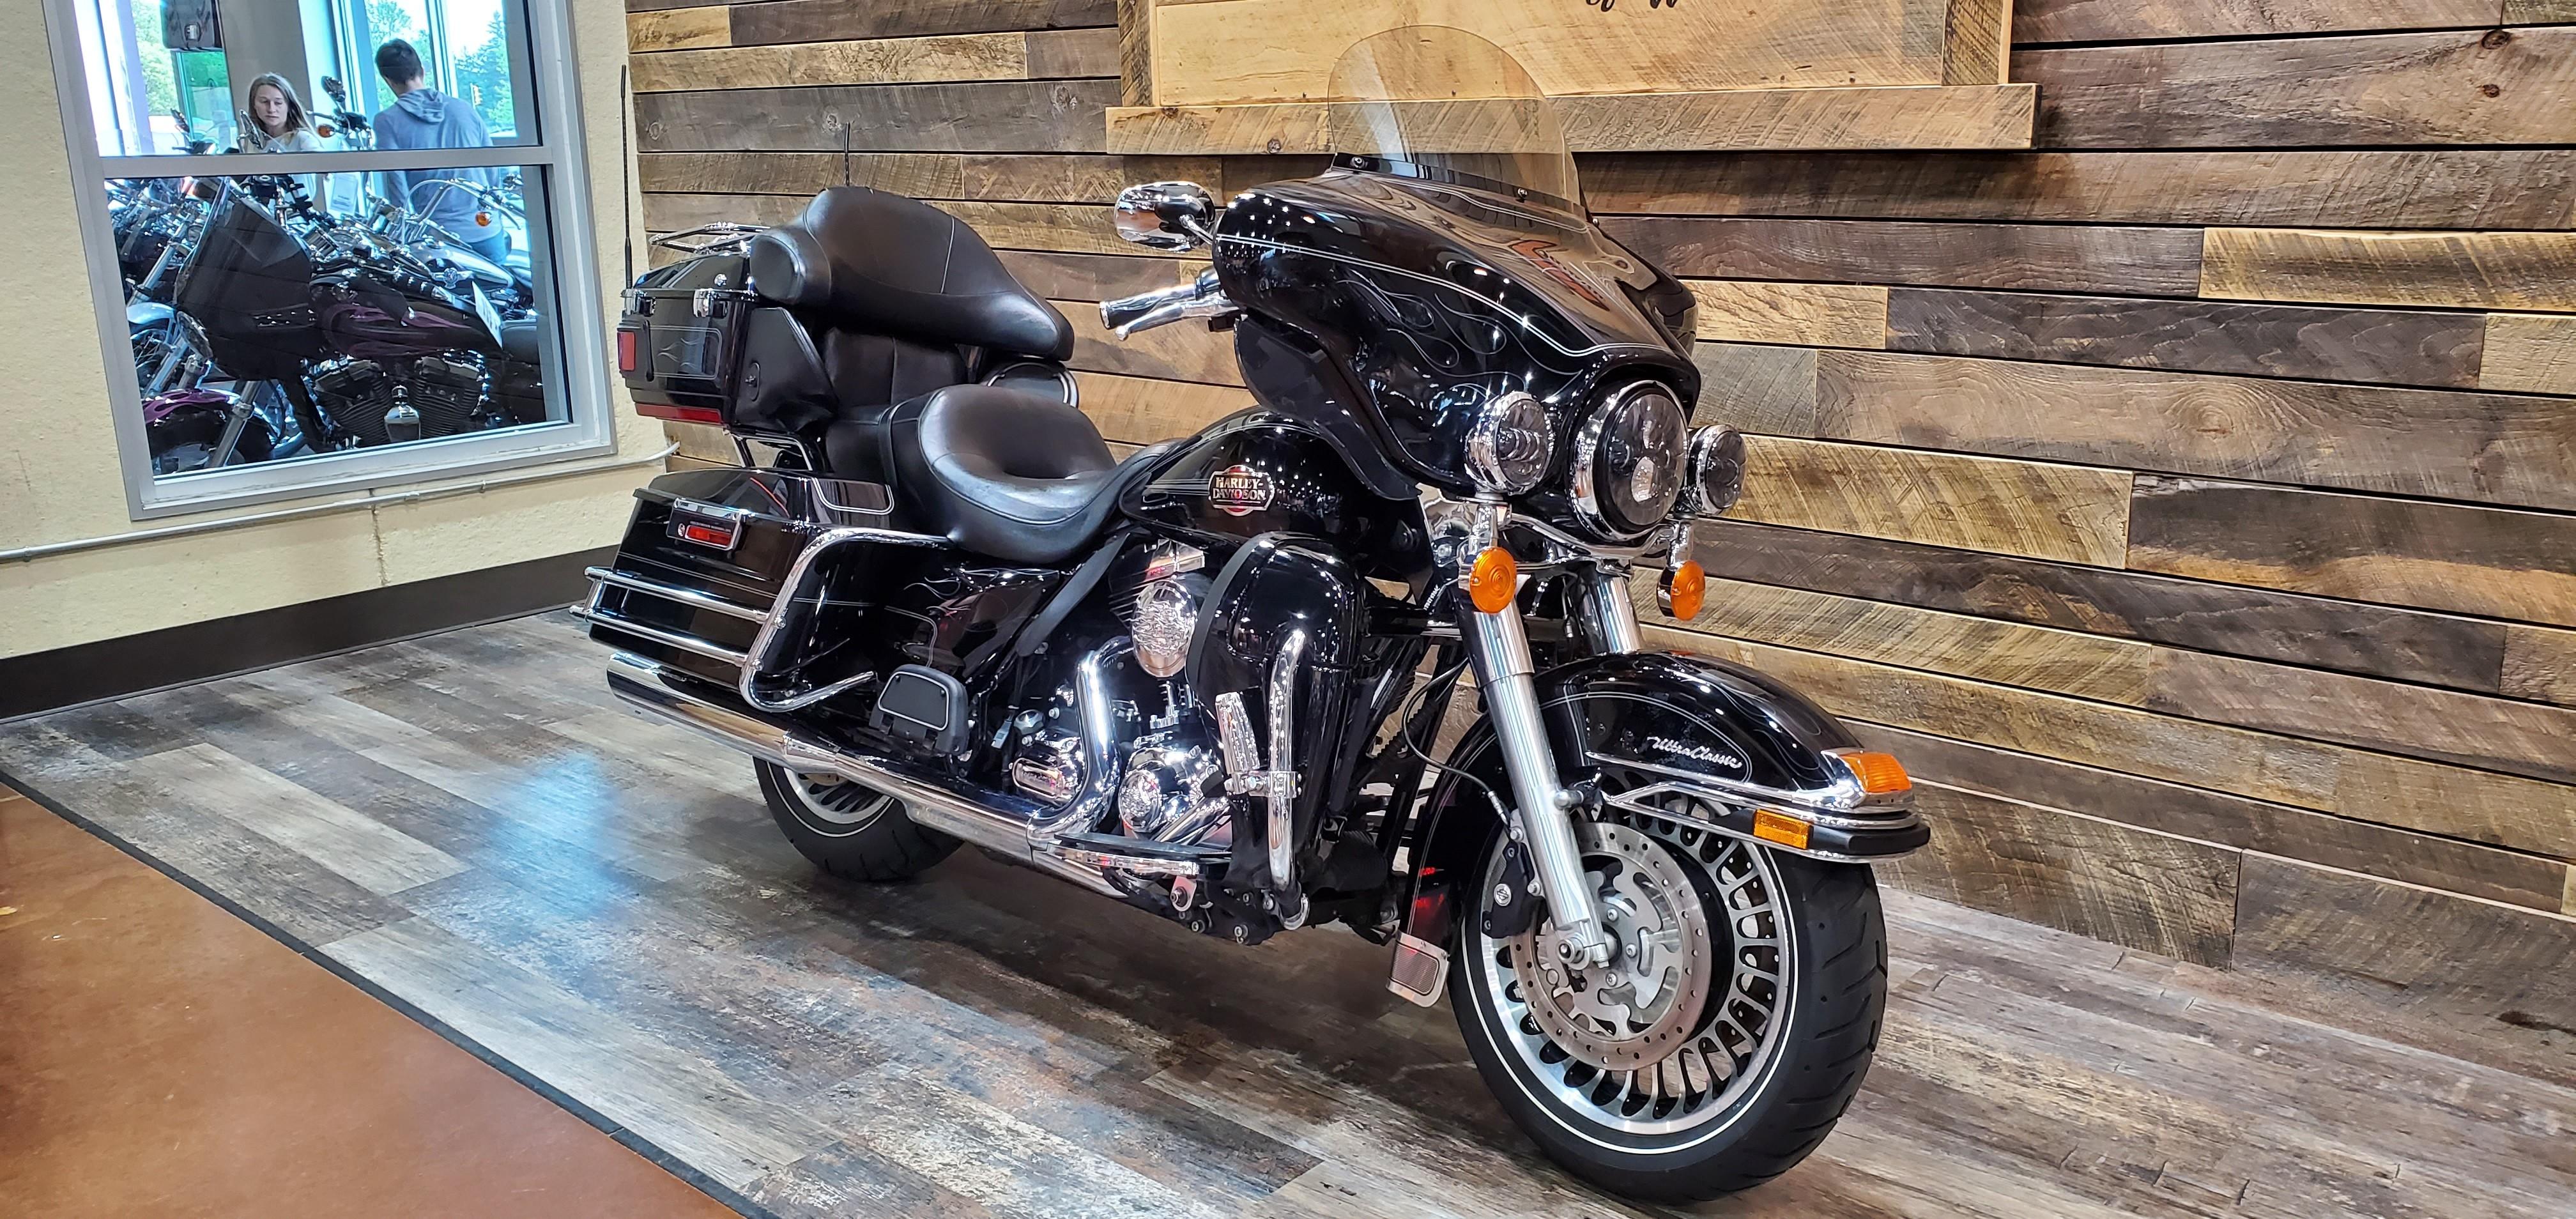 2009 Harley-Davidson Electra Glide Ultra Classic at Bull Falls Harley-Davidson